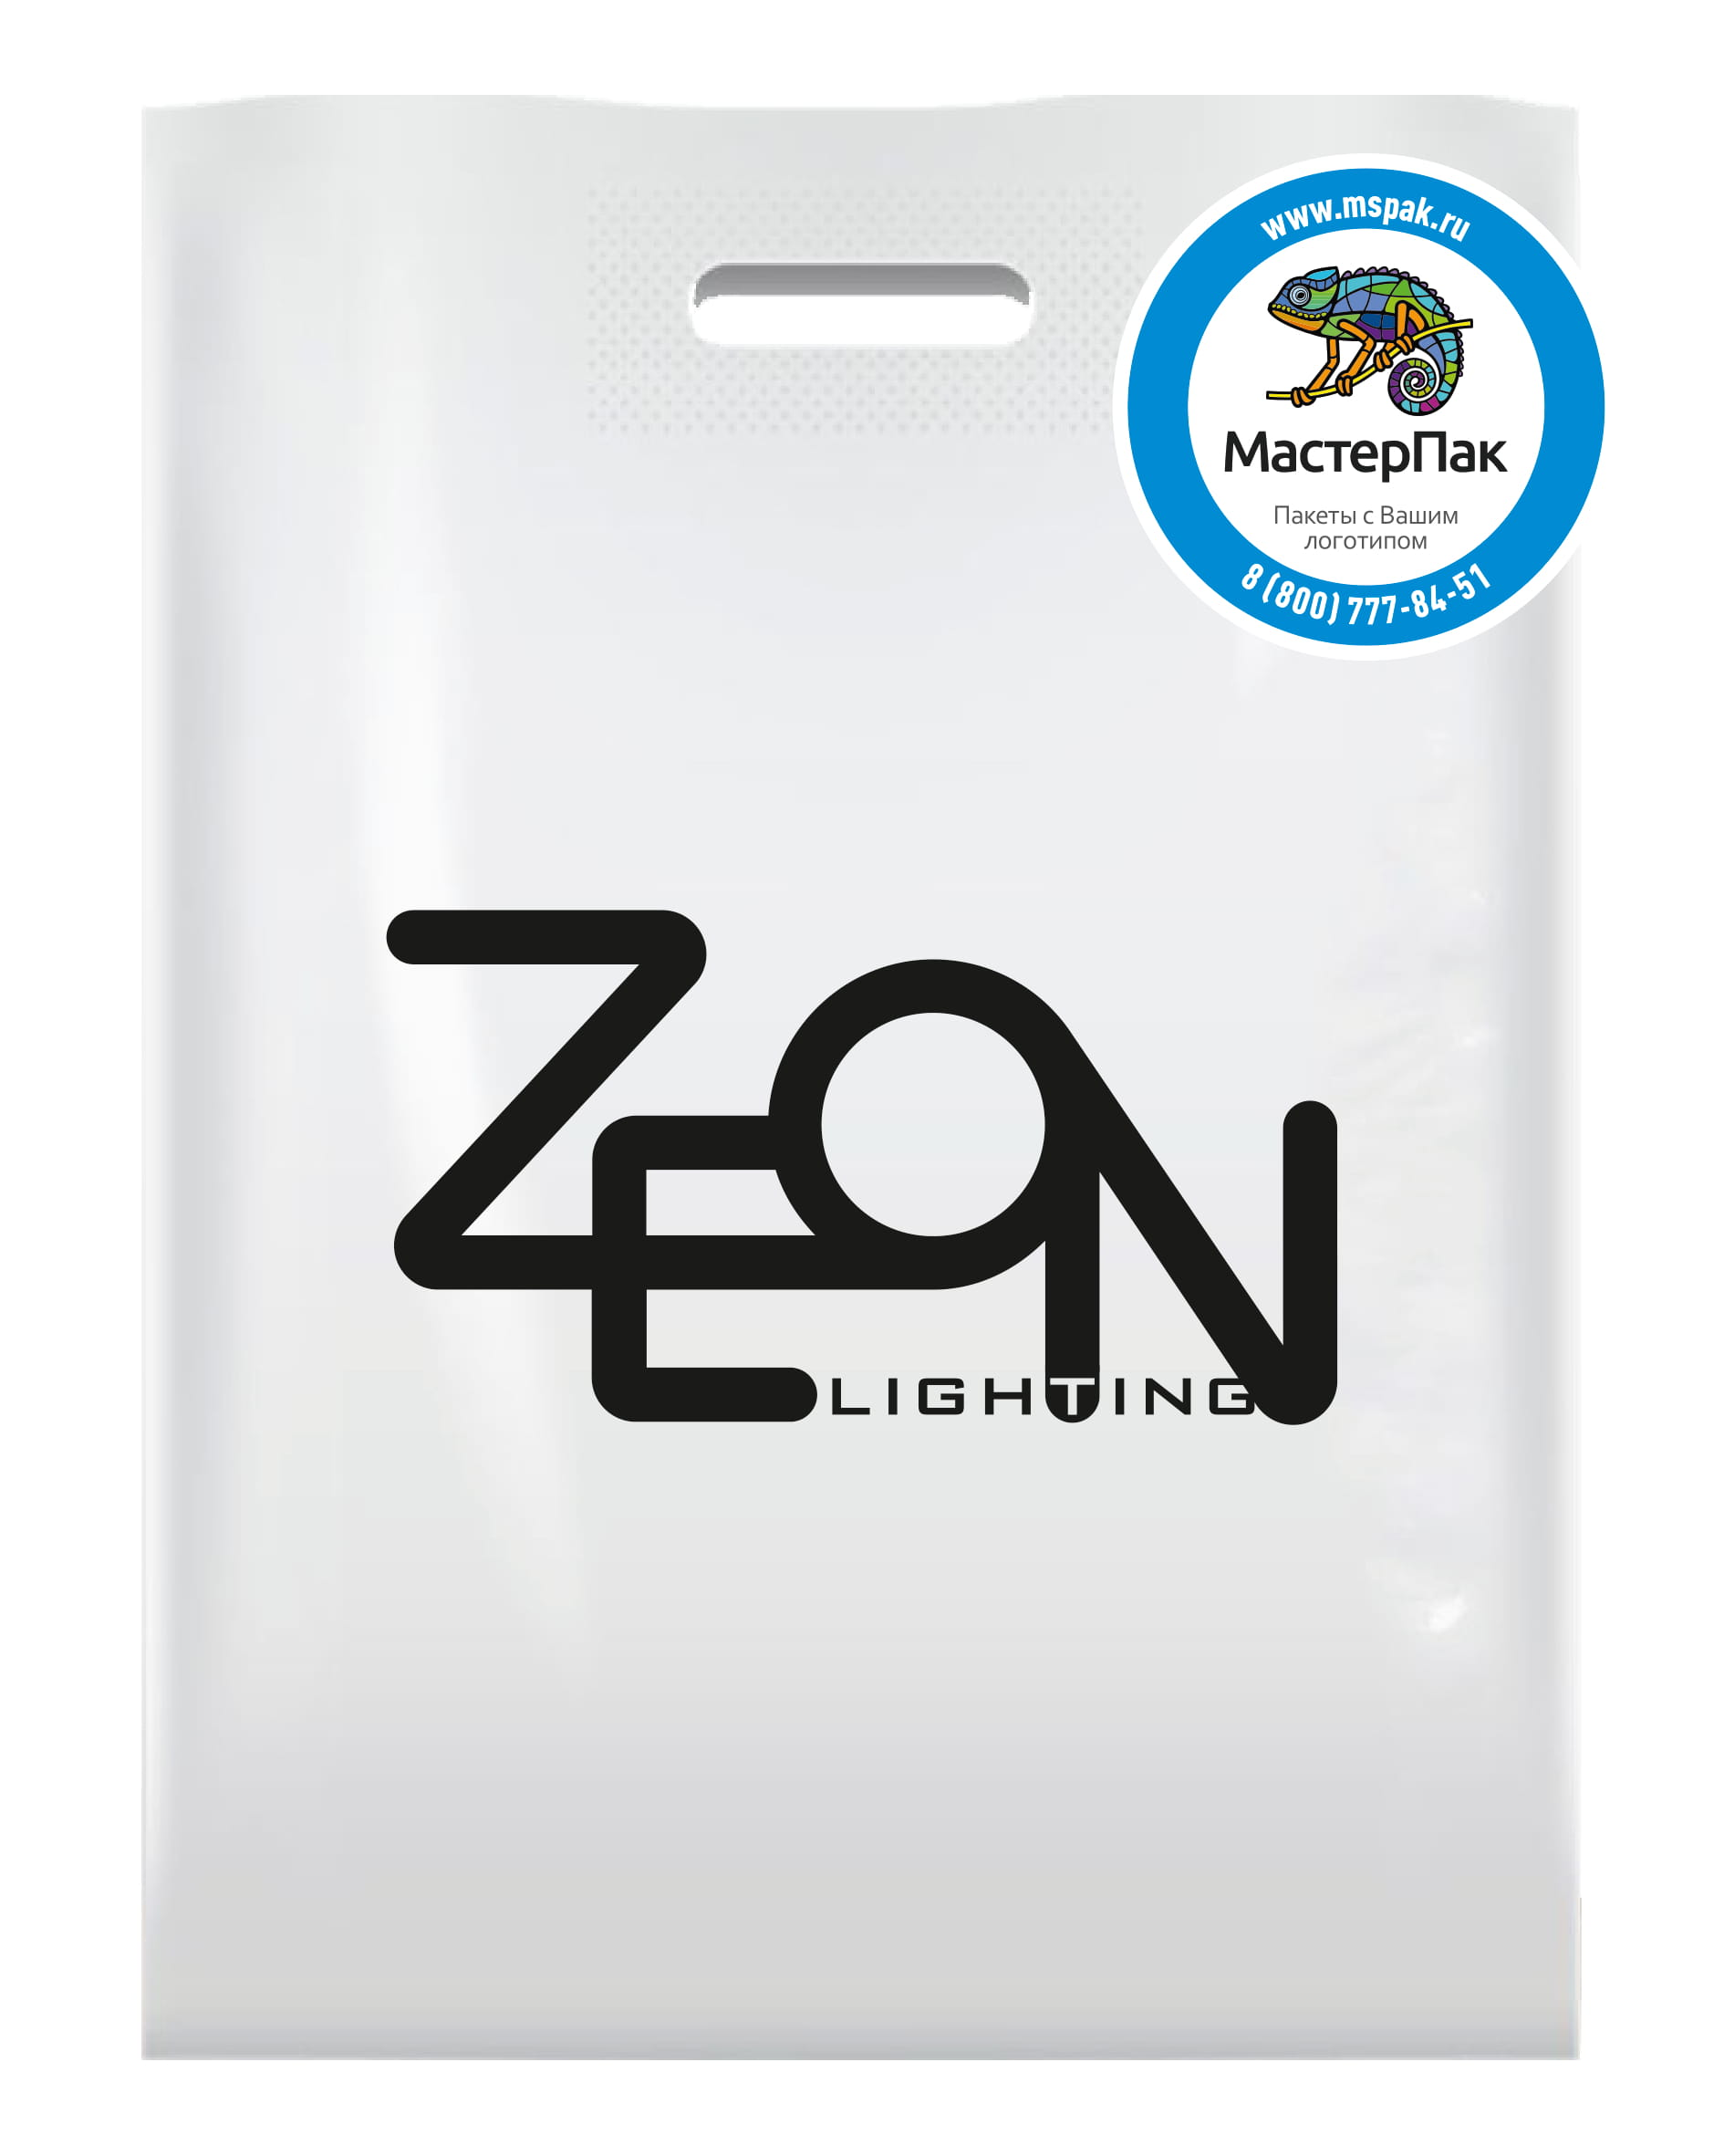 Пакет ПВД с логотипом магазина Zeon, Москва, белый